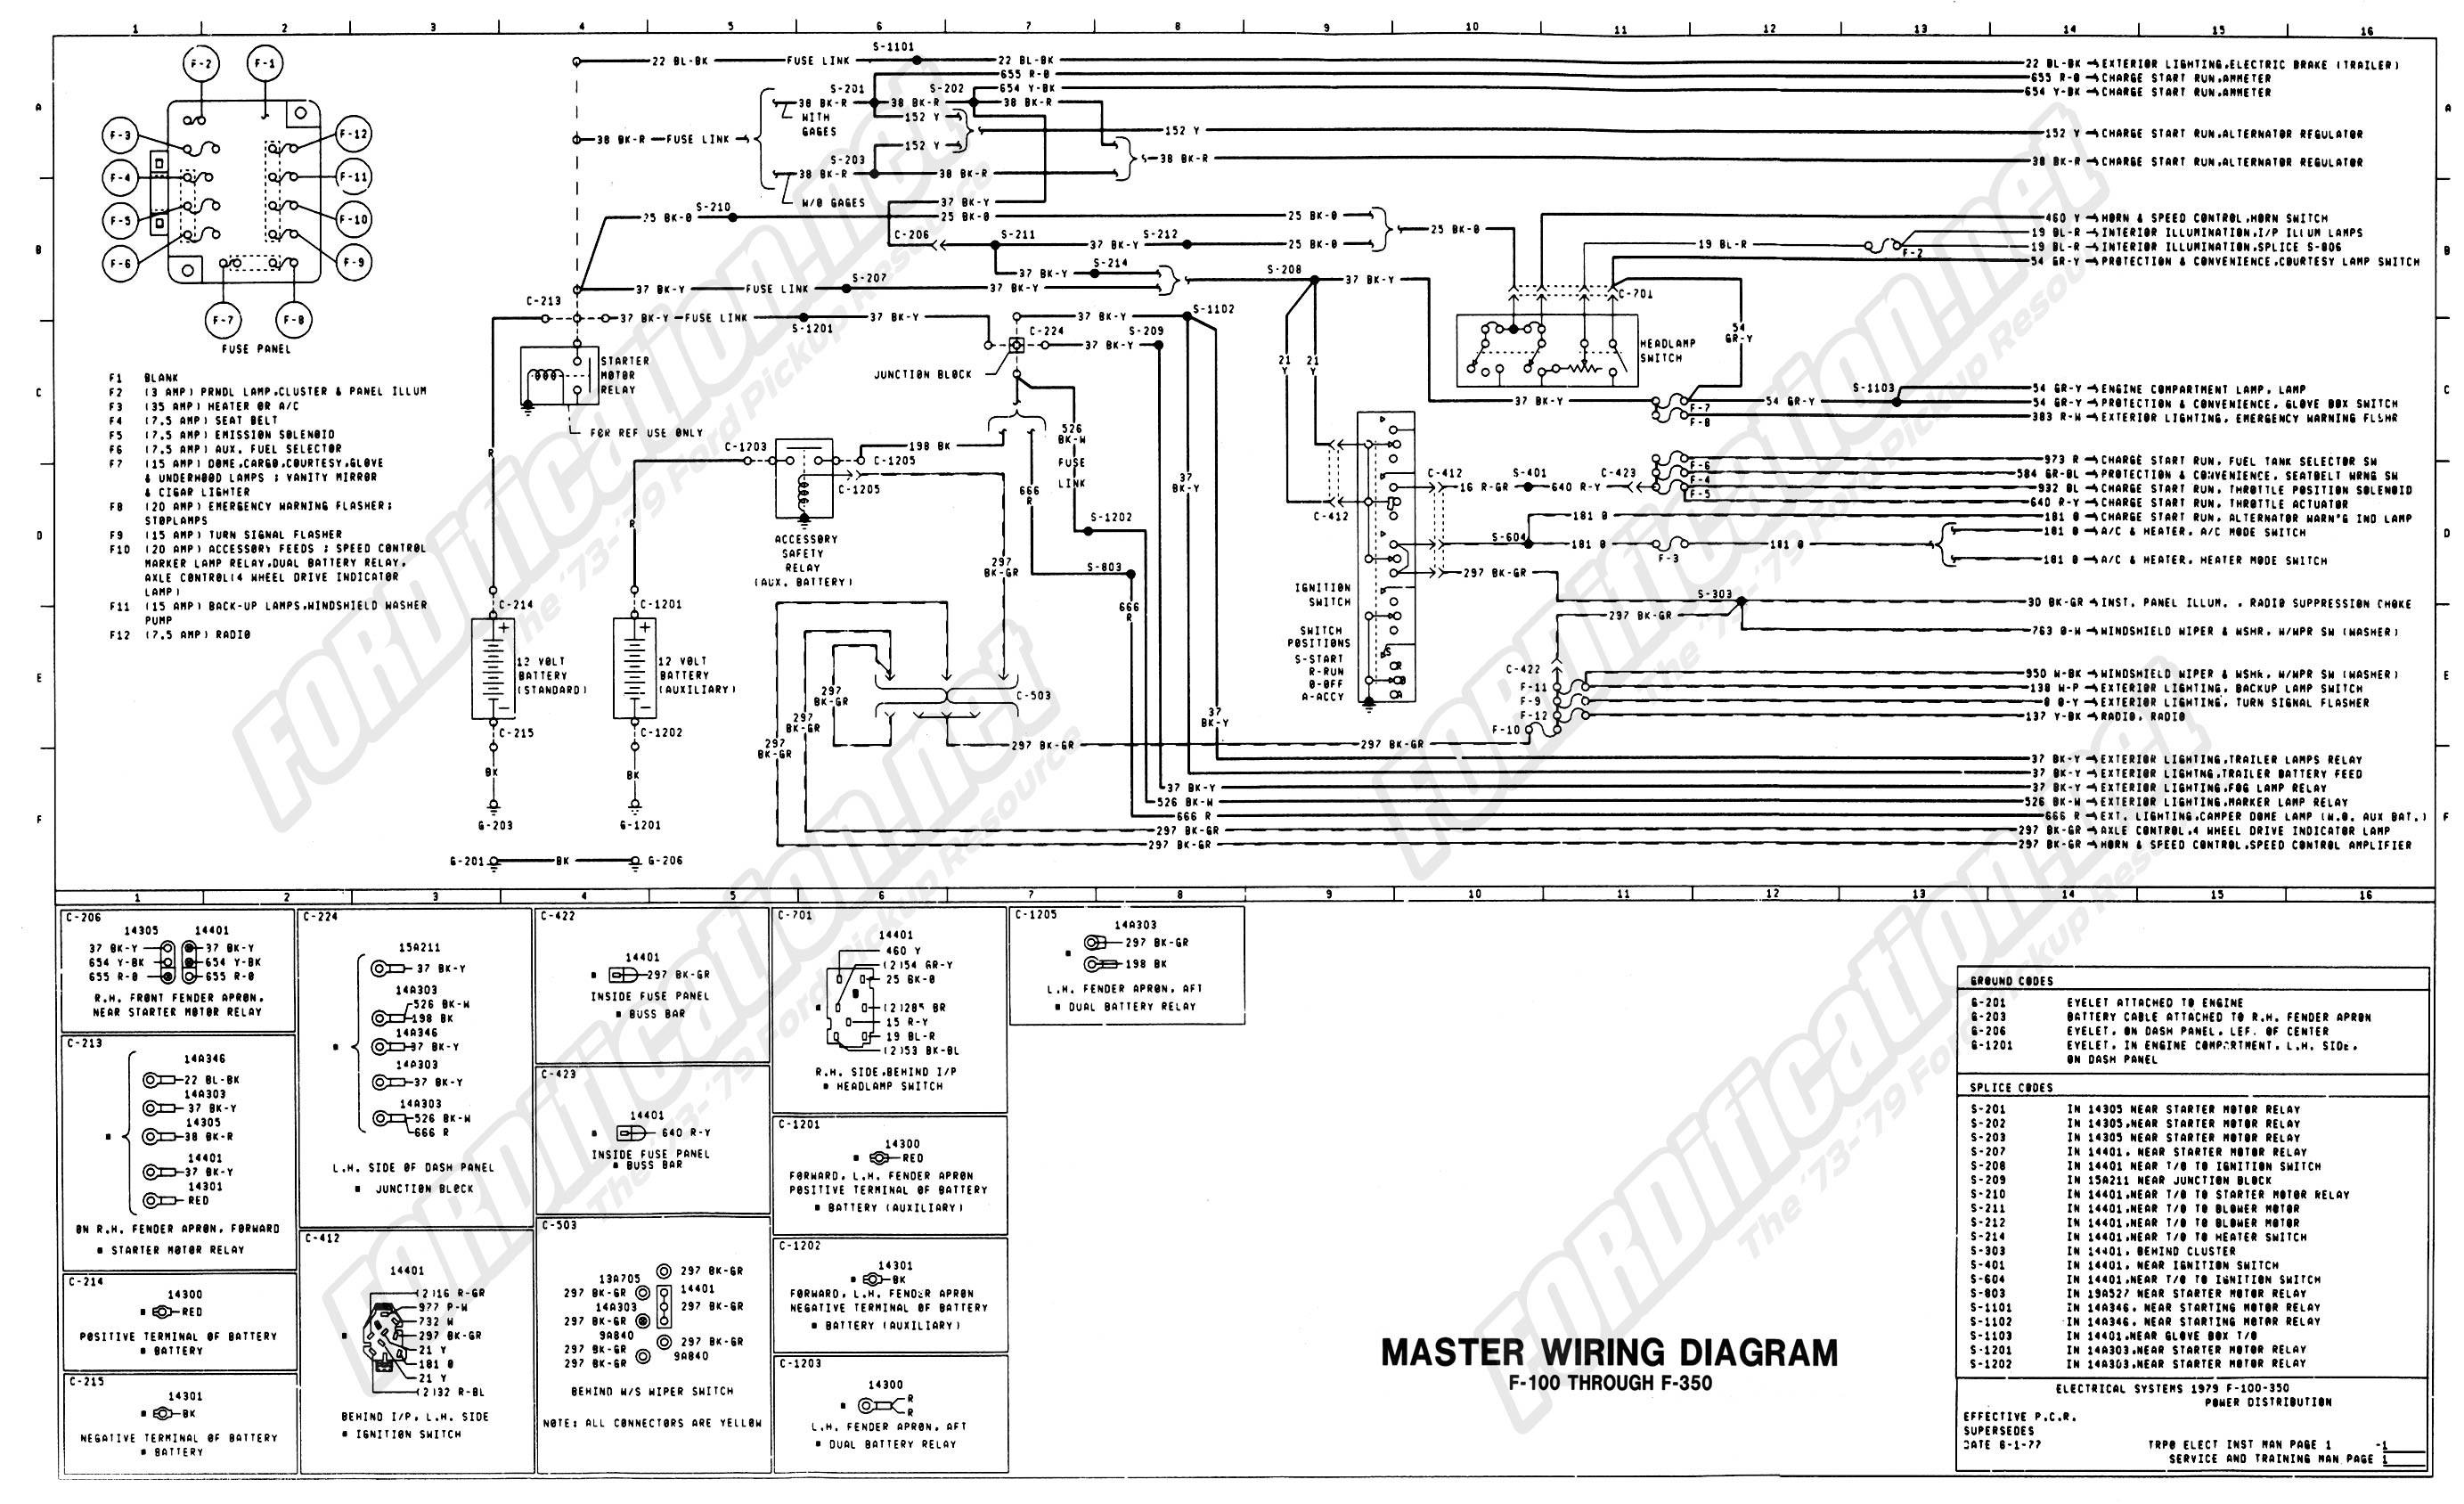 2006 Chevy Silverado Tail Light Wiring Diagram Sterling Wiring Diagram Wiring Diagram Of 2006 Chevy Silverado Tail Light Wiring Diagram